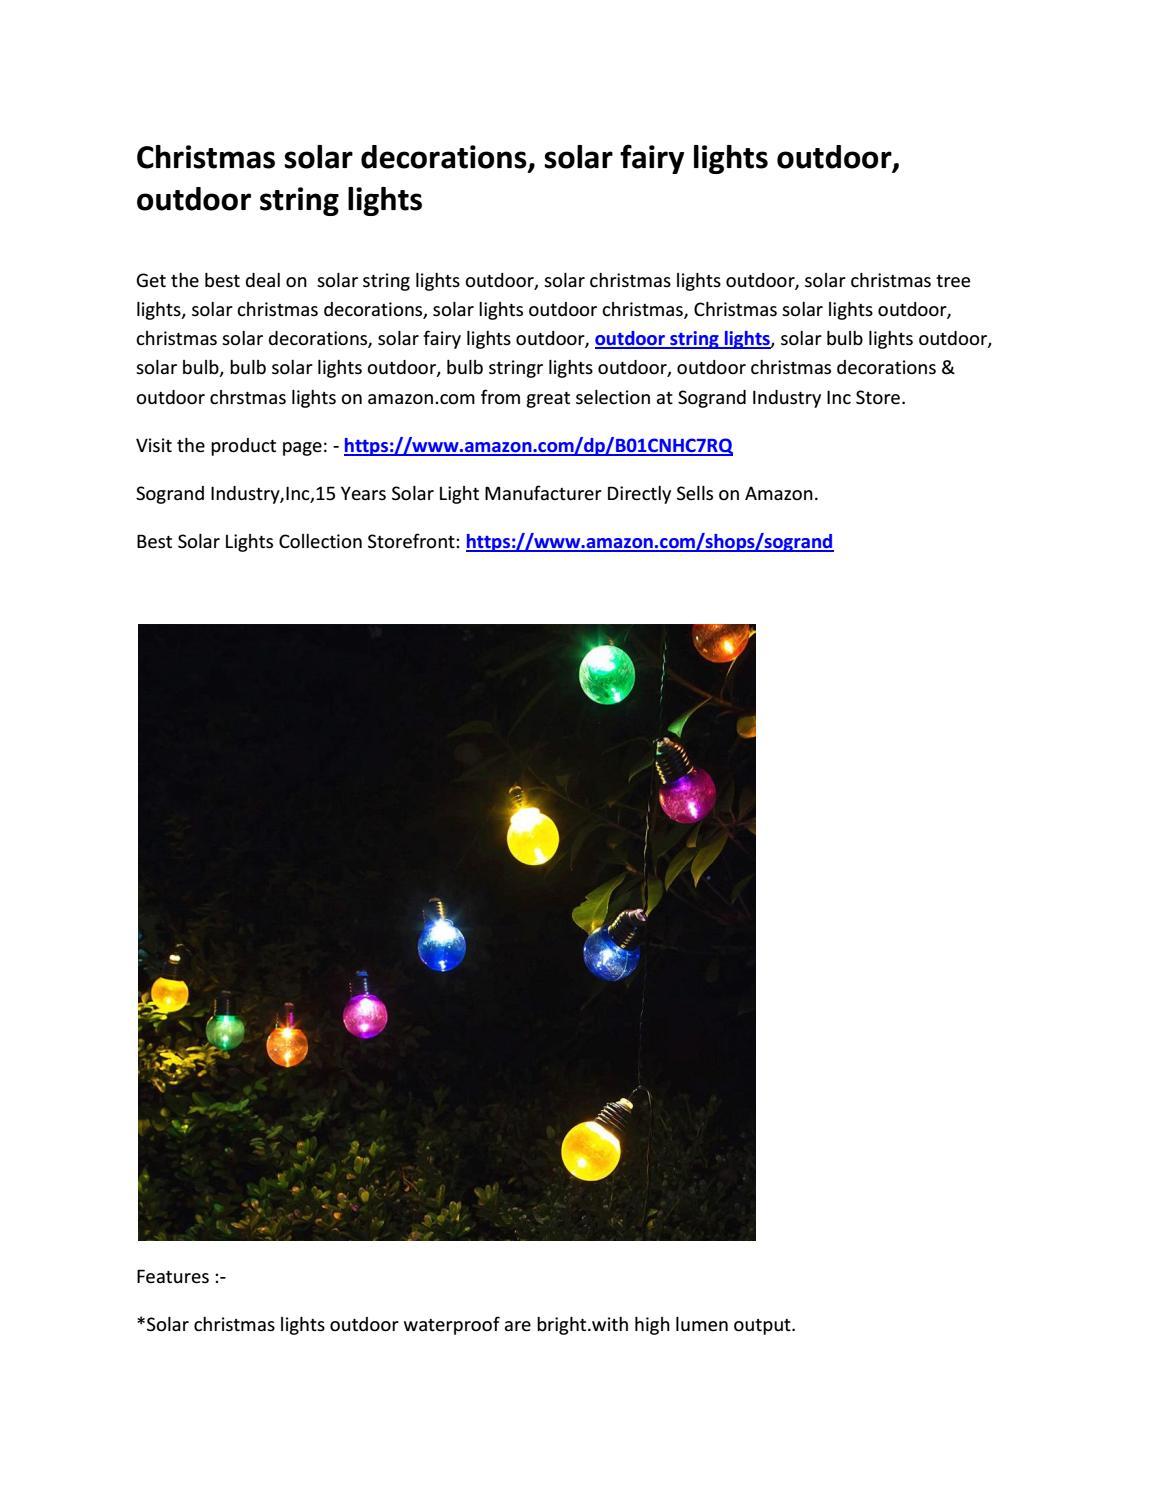 Christmas Solar Decorations Solar Fairy Lights Outdoor Outdoor